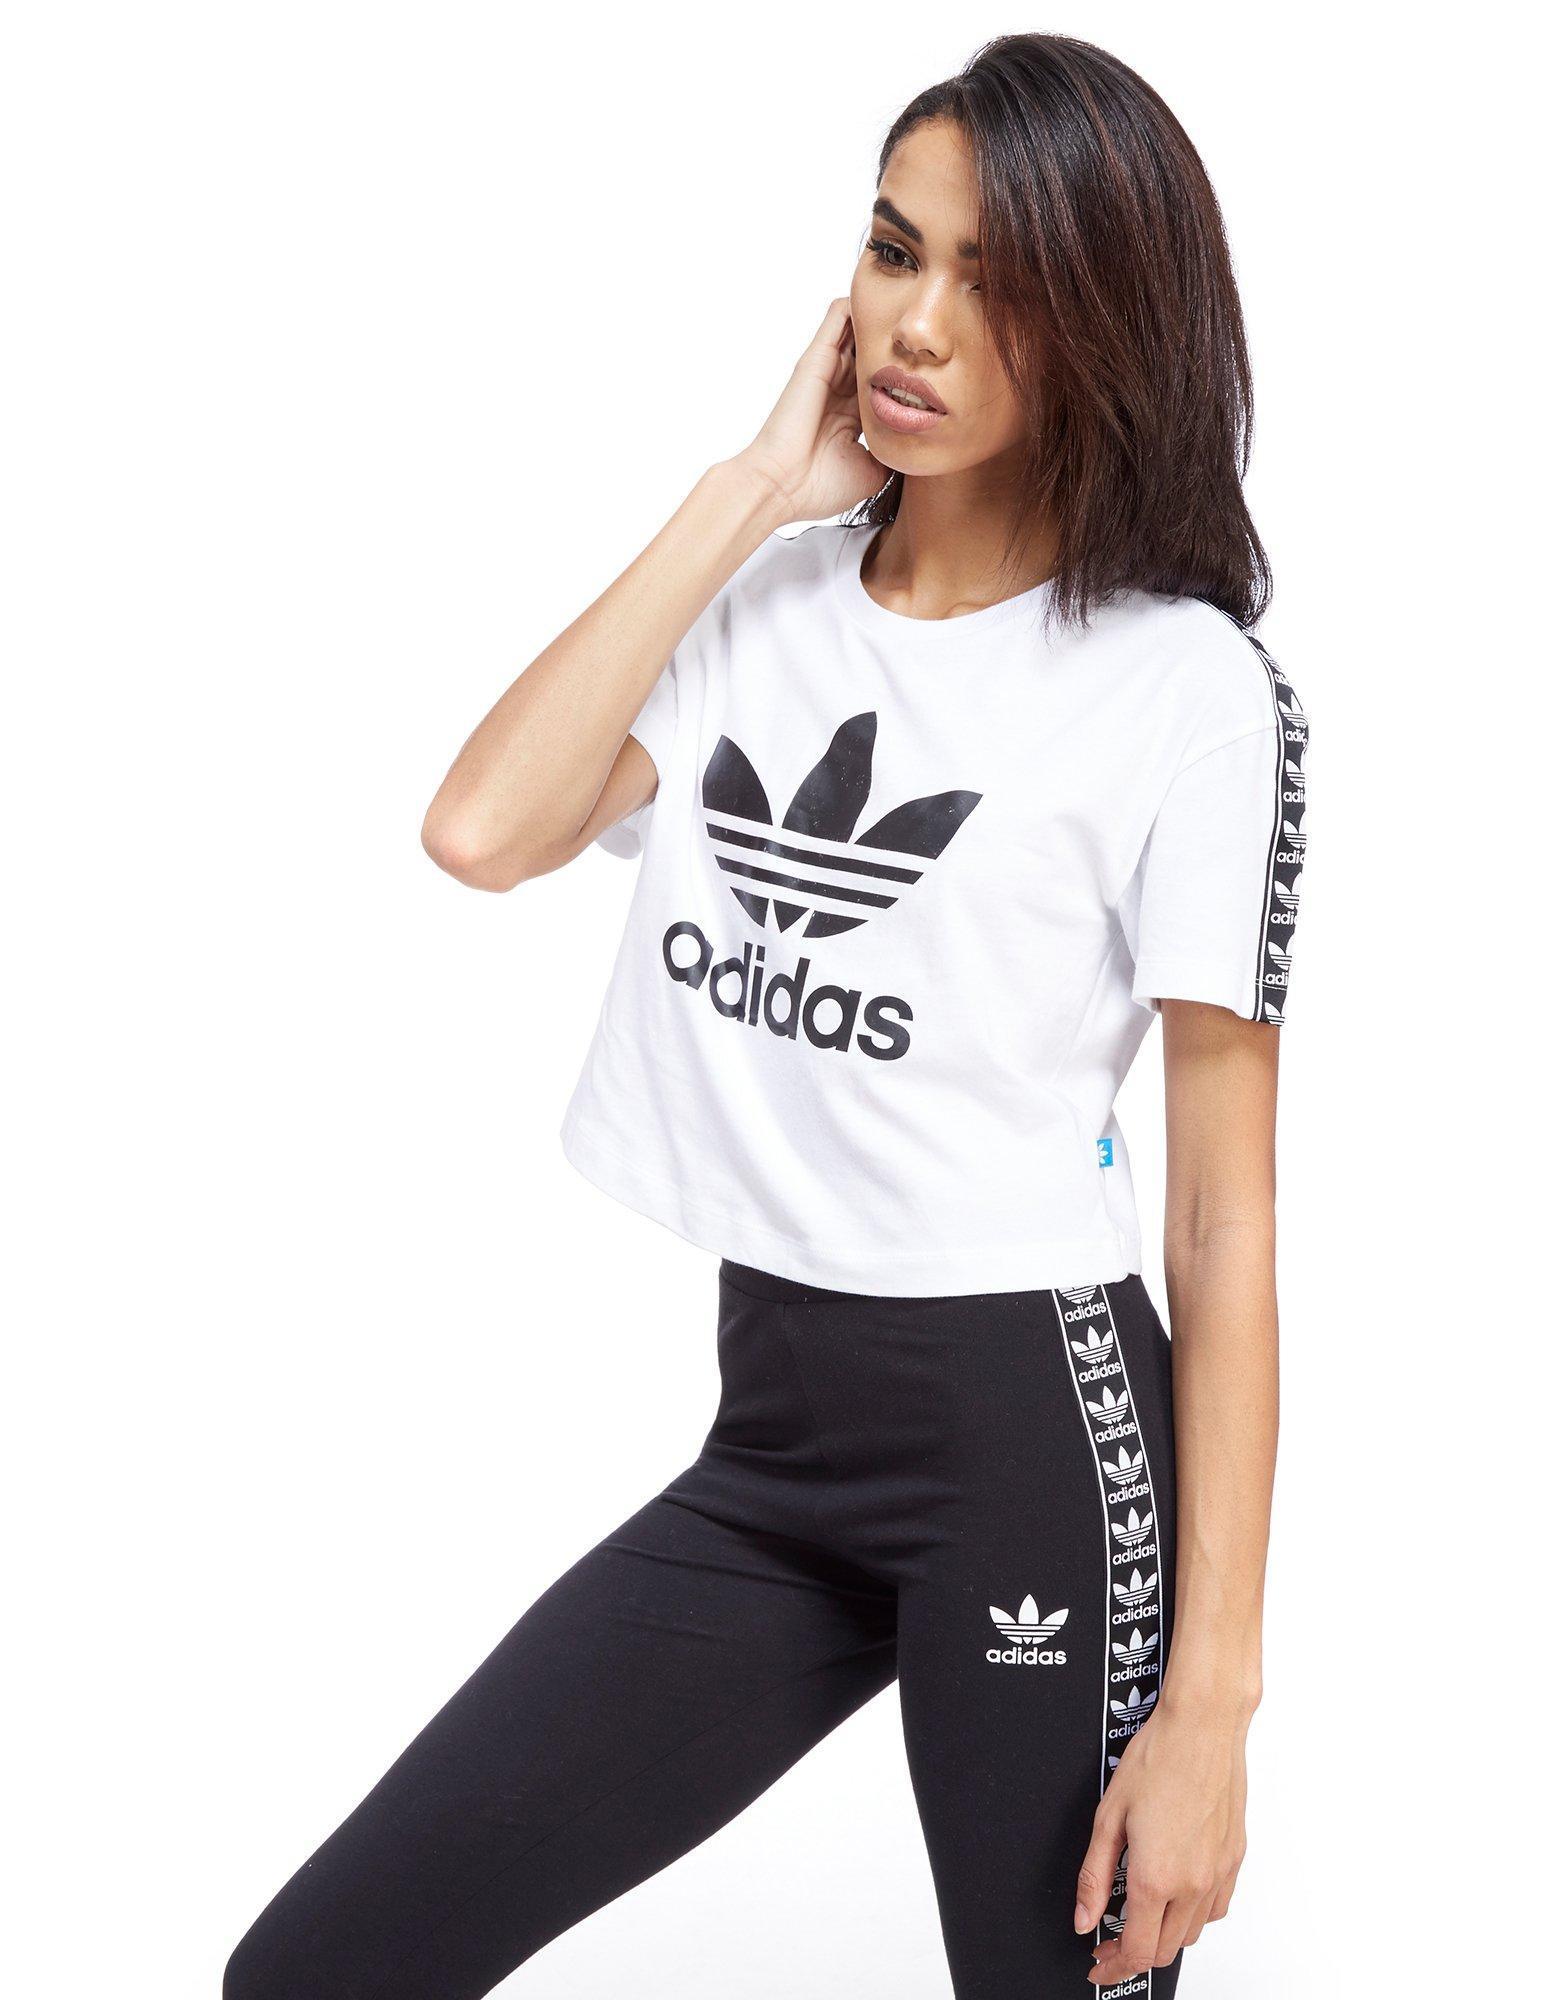 c509ae281d6 adidas Originals Tape Crop T-shirt in White - Lyst